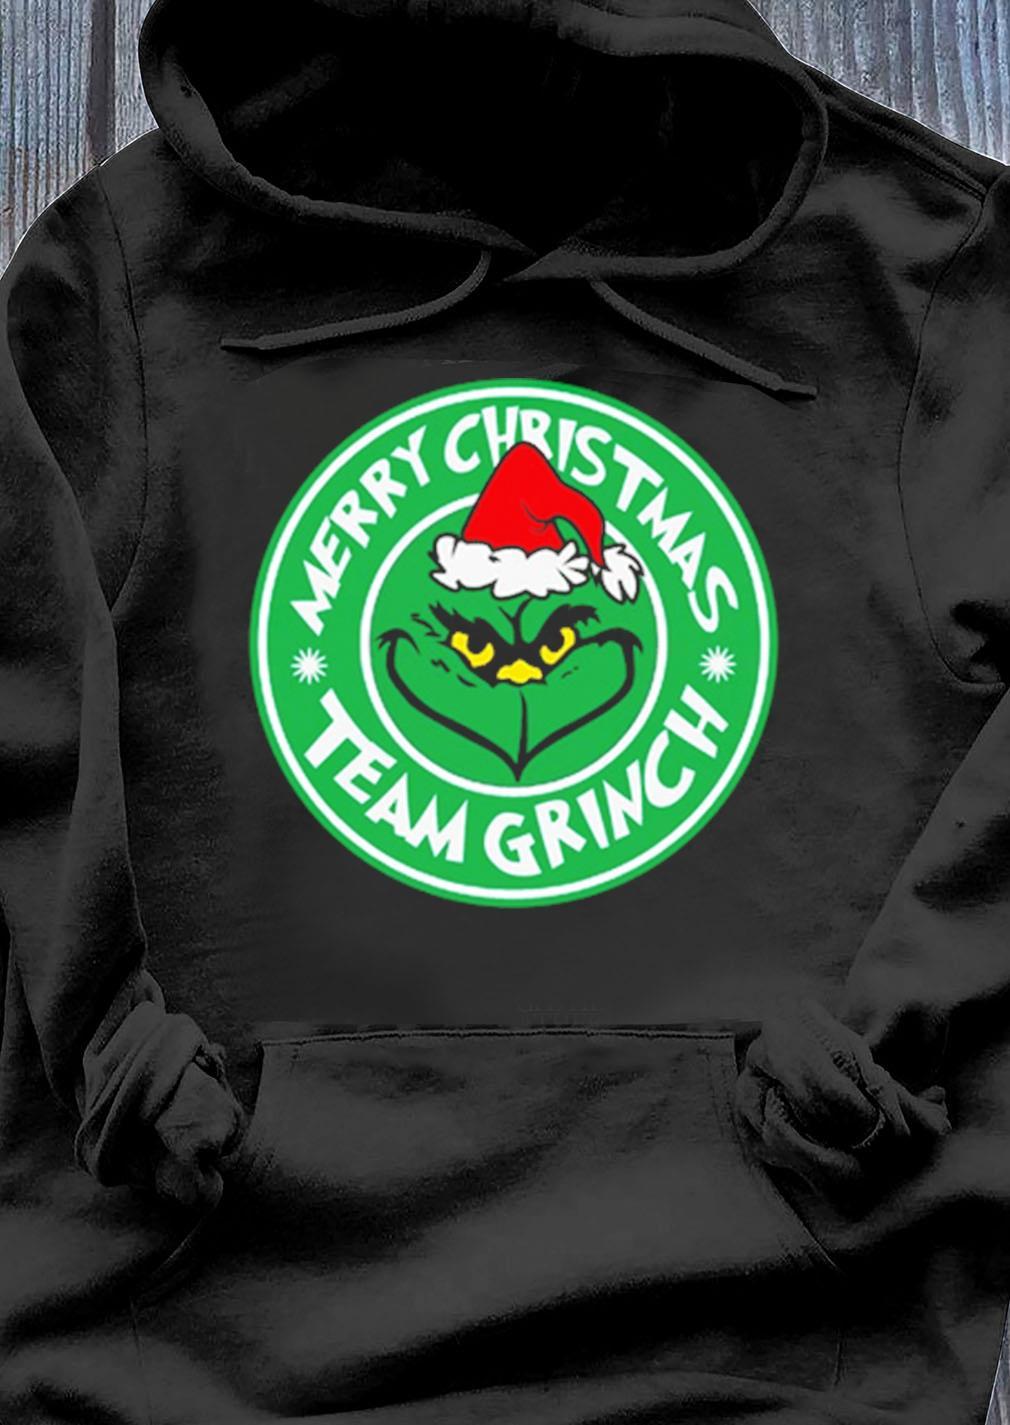 Merry Christmas Team Grinch Shirt Hoodie